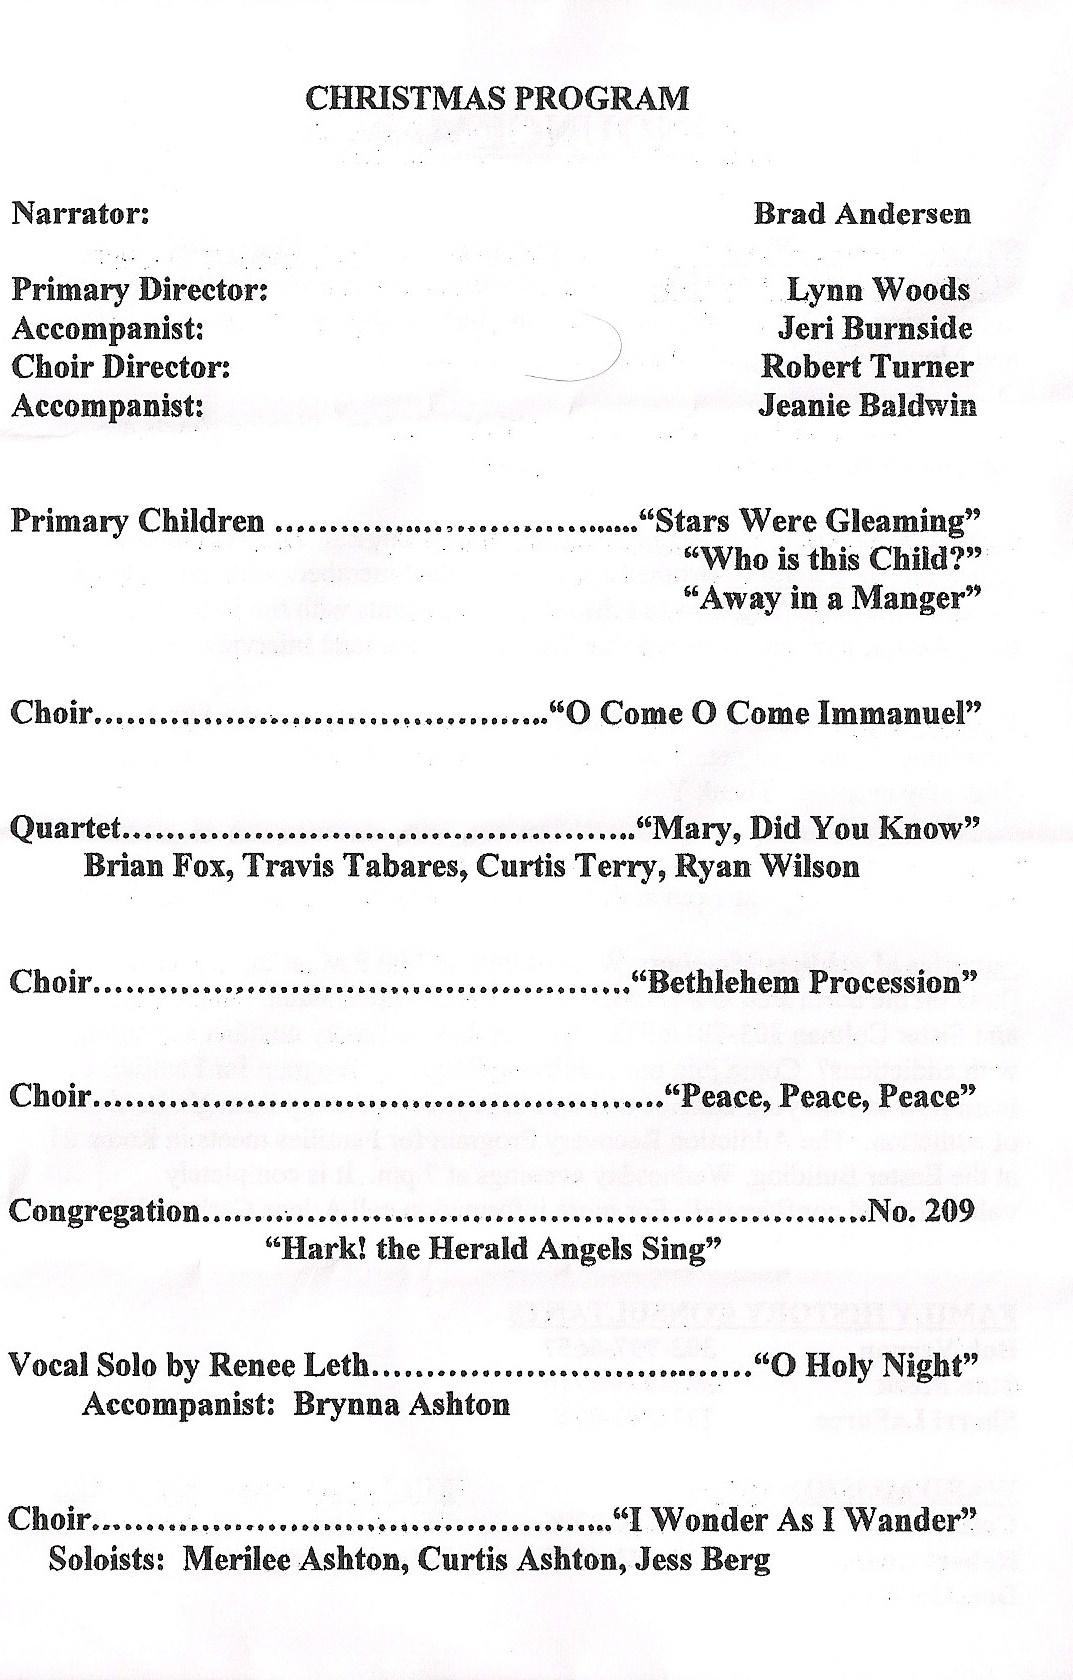 Littleton Ward Sacrament Meeting Program, page 3, 12-20-09